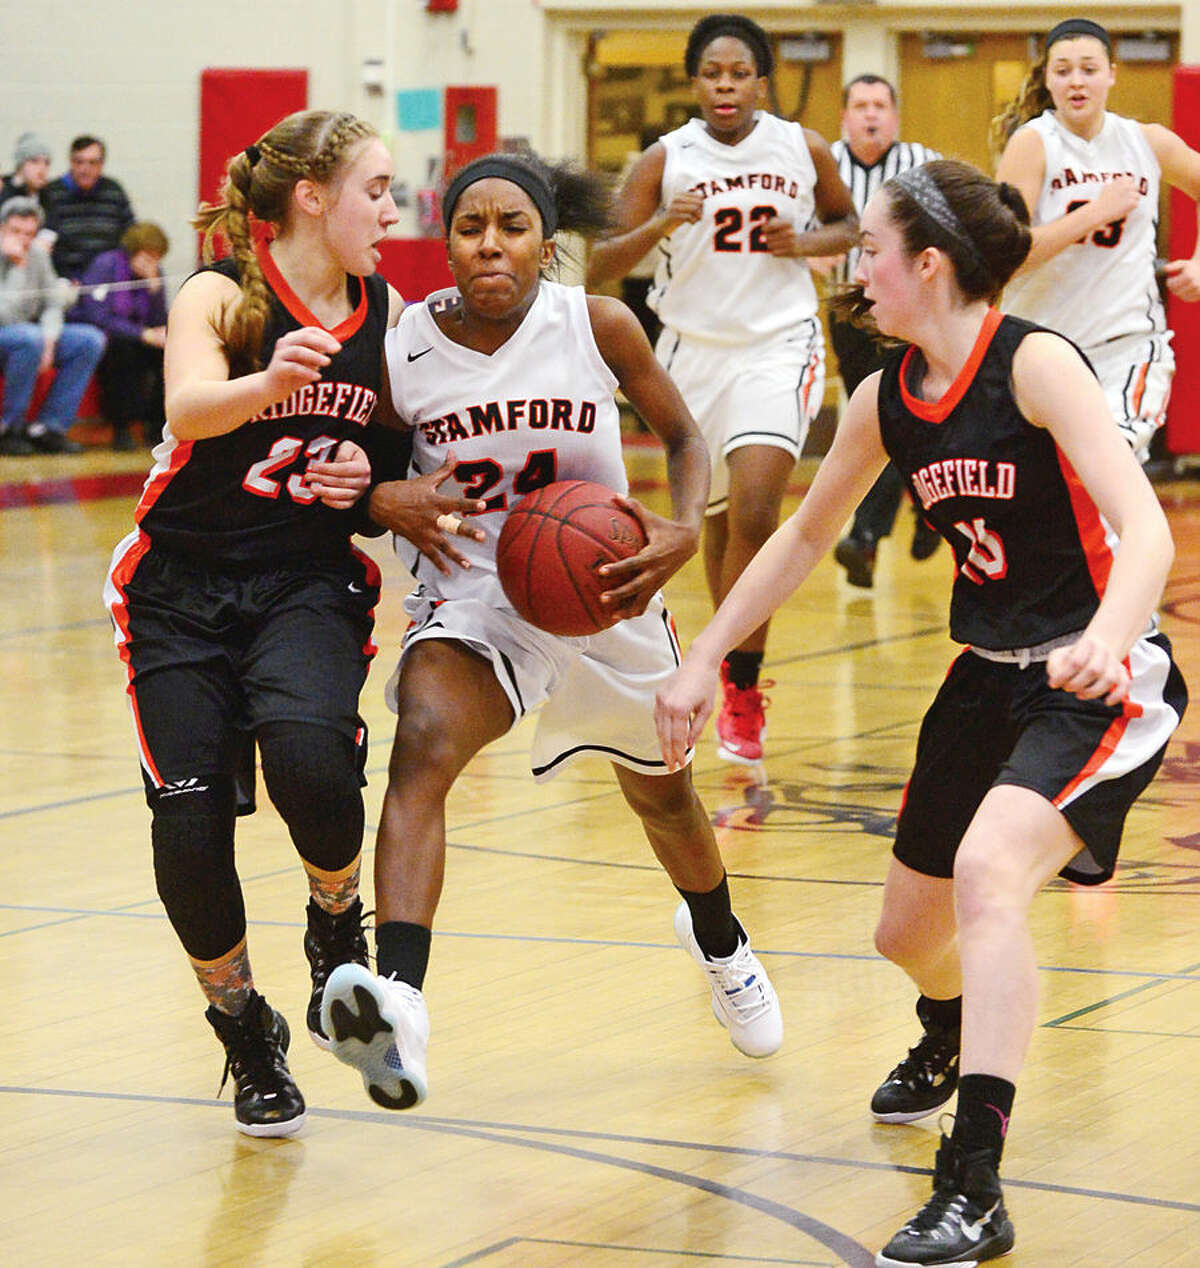 Stamford High School 's #24 Tiana England battles Ridgefield's #23 Jessica Camarda and #10 Megan O'Hara during the FCIAC Girls Basketball Quarterfinals Saturday at Fairfield Warde High School.